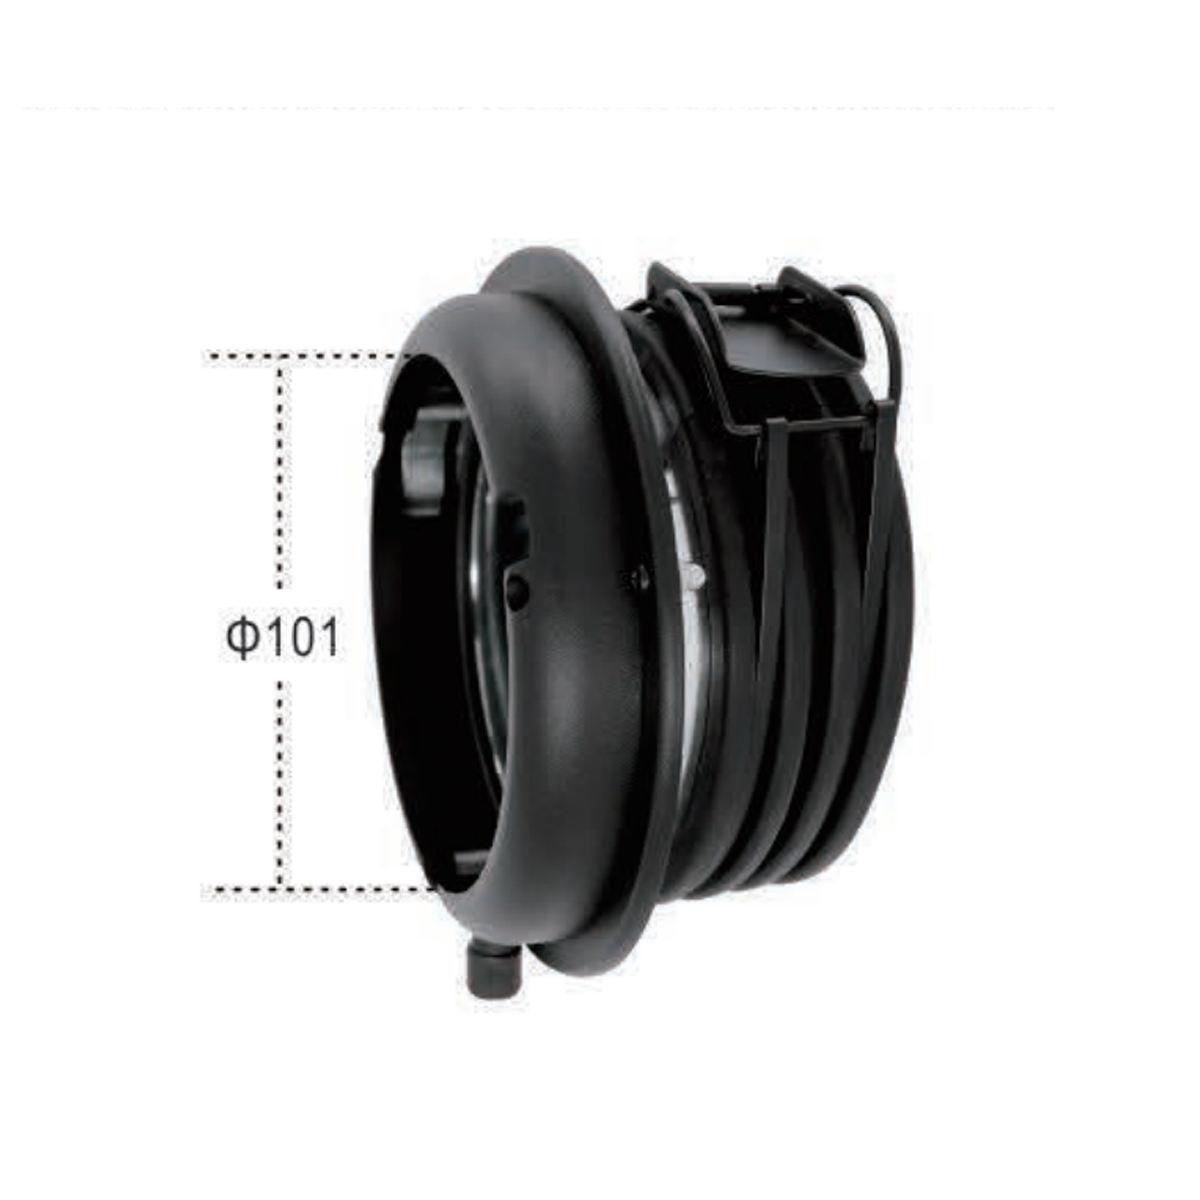 TM Profoto to Bowens Speedring Adapter Simple Studio